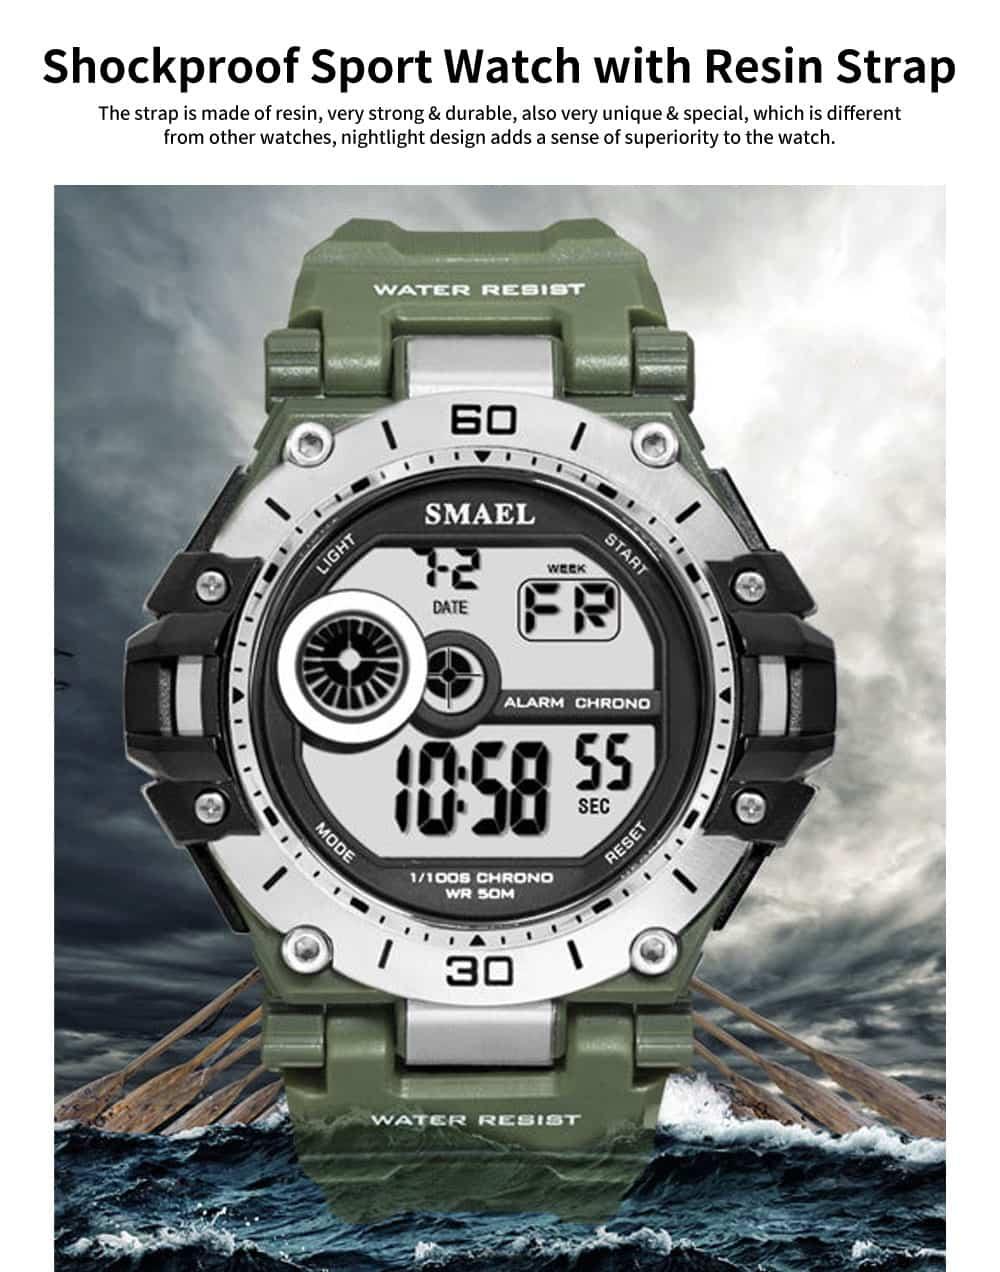 Men's Shockproof Sport Watch with Resin Strap, Digital Waterproof Watch for Outdoor Use 0